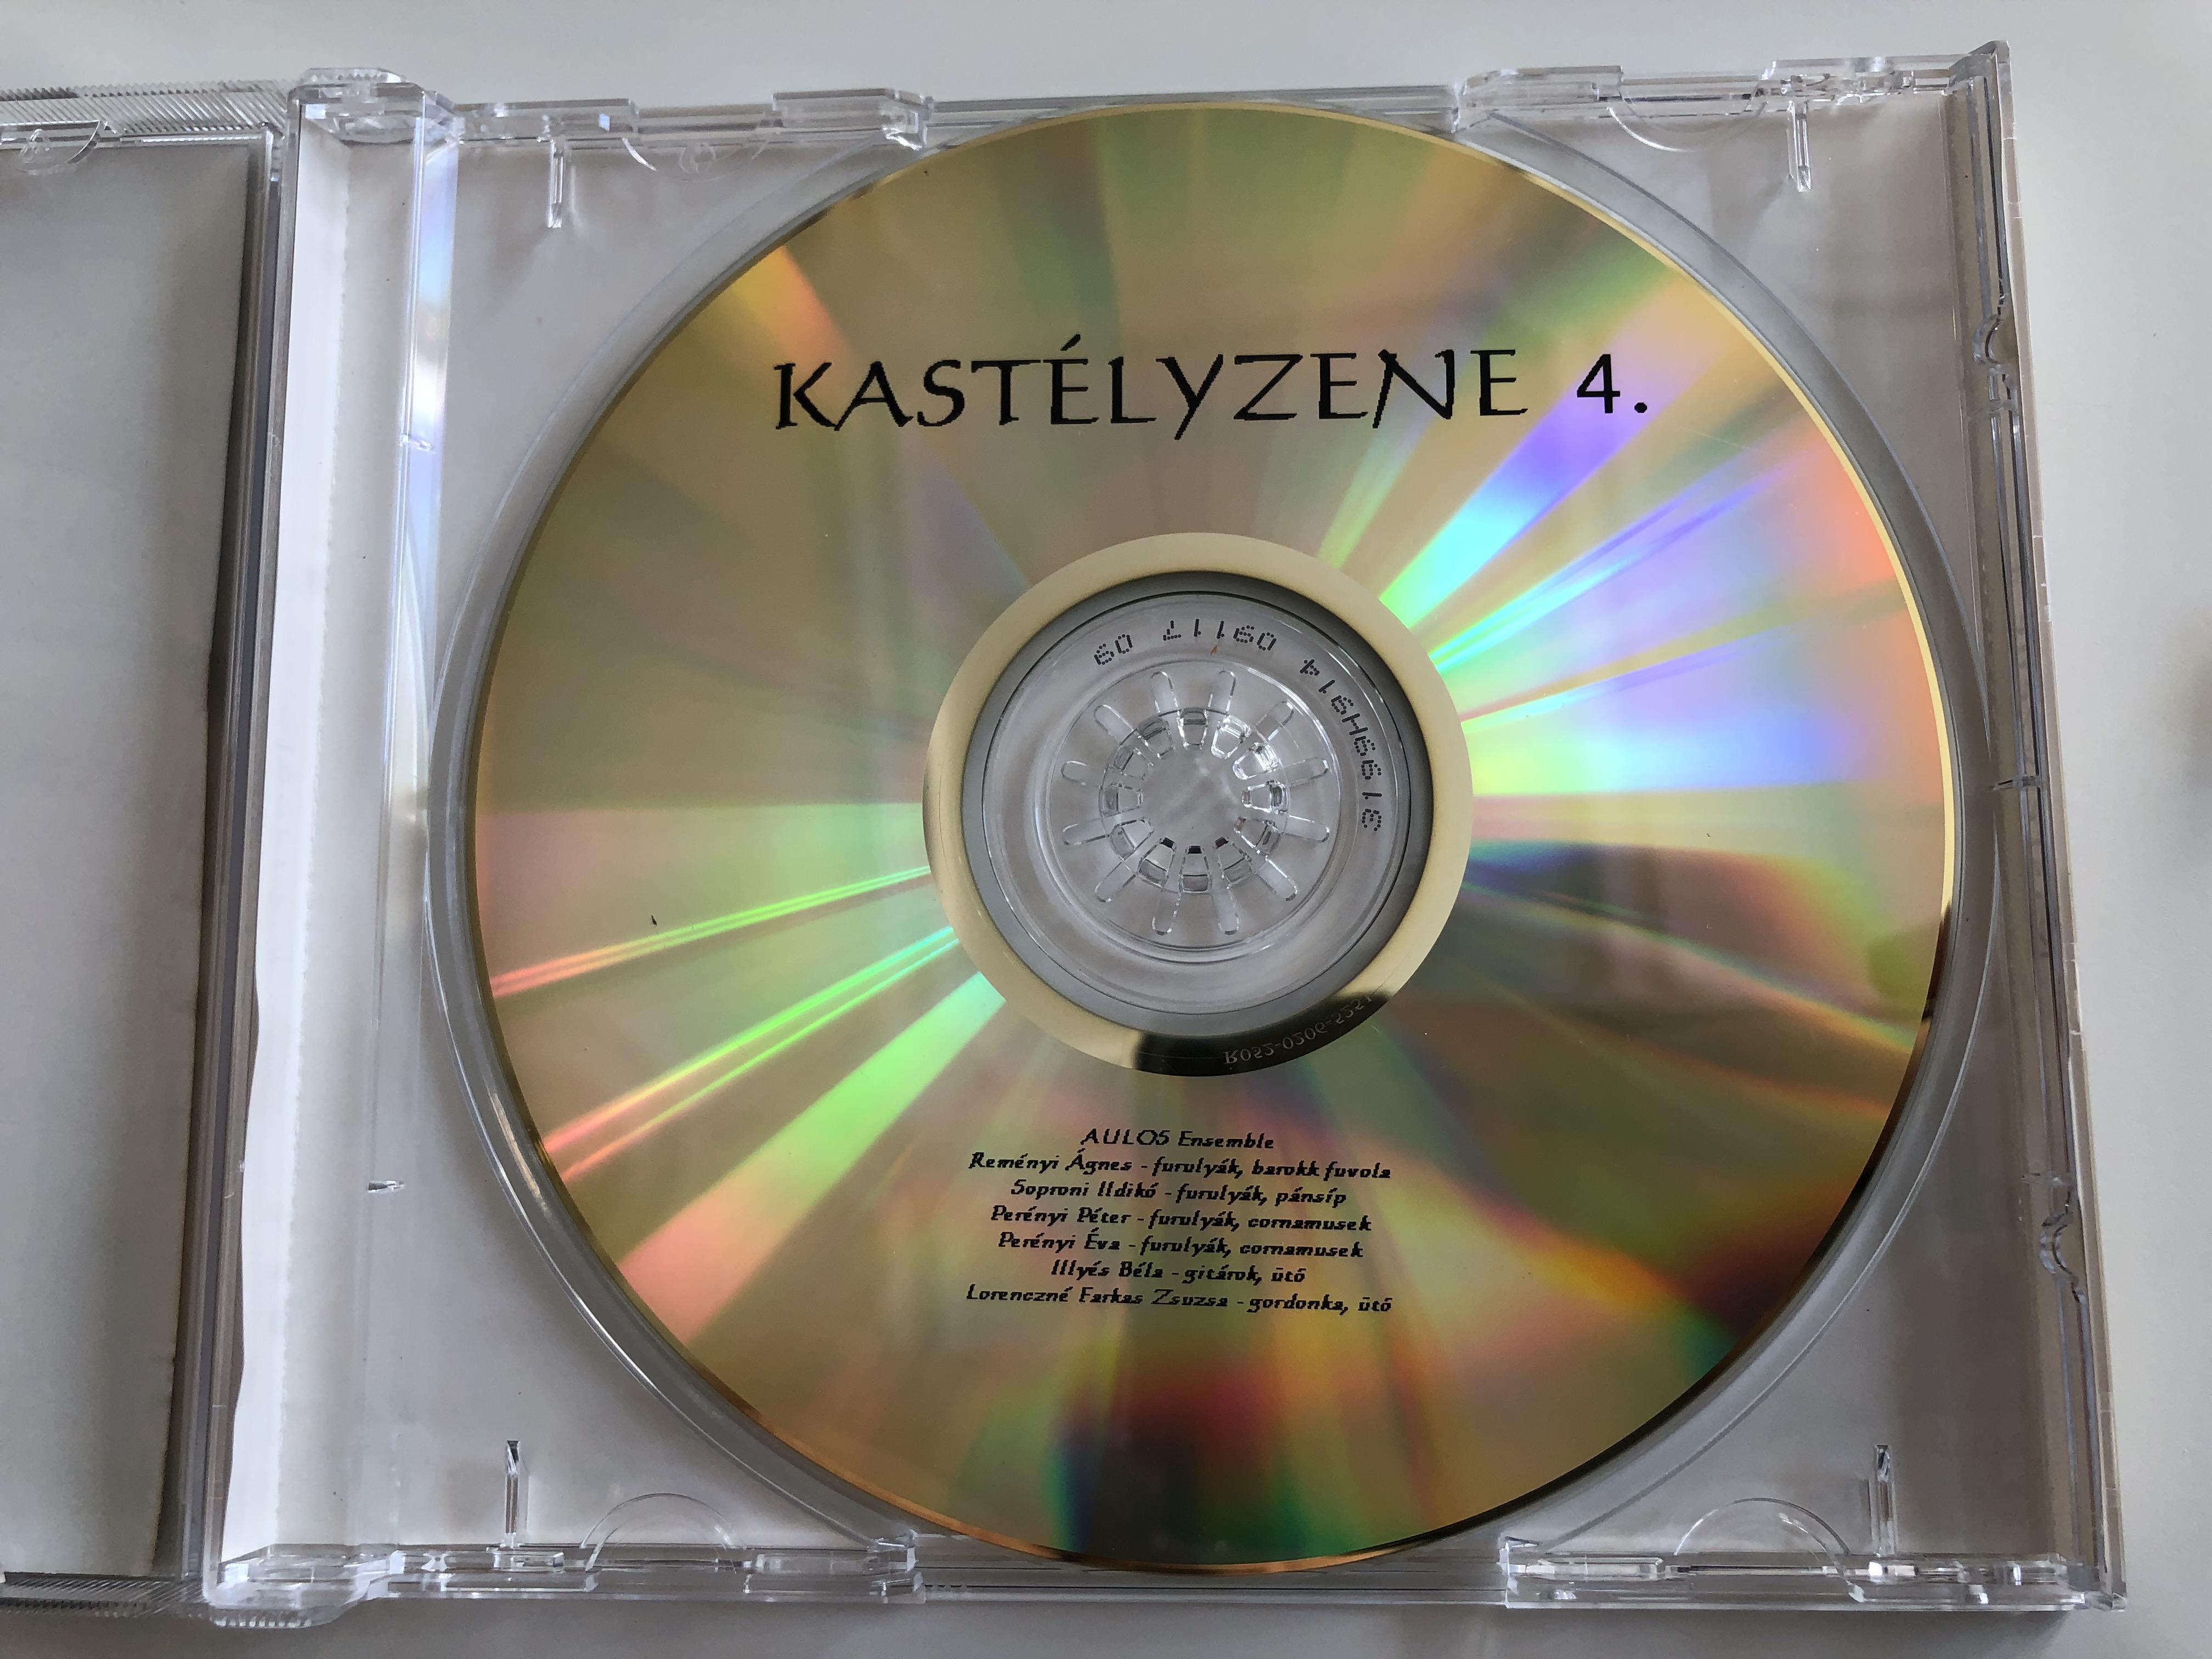 katelyzene-castle-music-4.-dalnok-kiado-audio-cd-5999536950260-3-.jpg